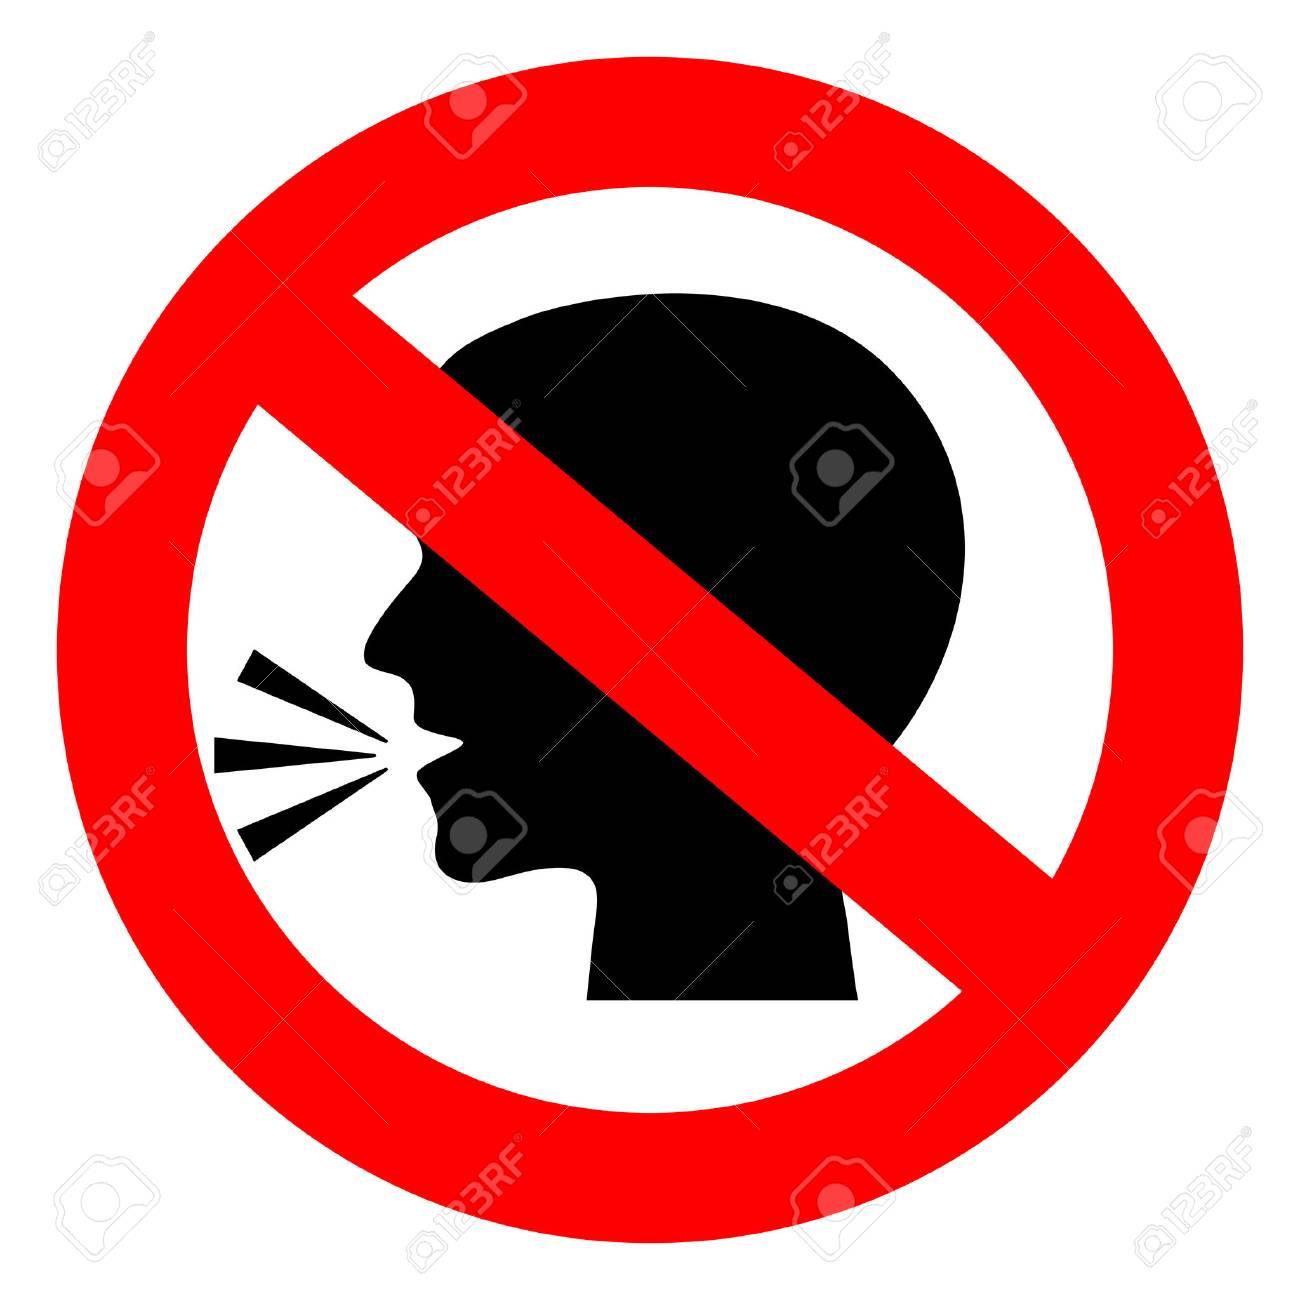 Stop talking vector sign - 90002544